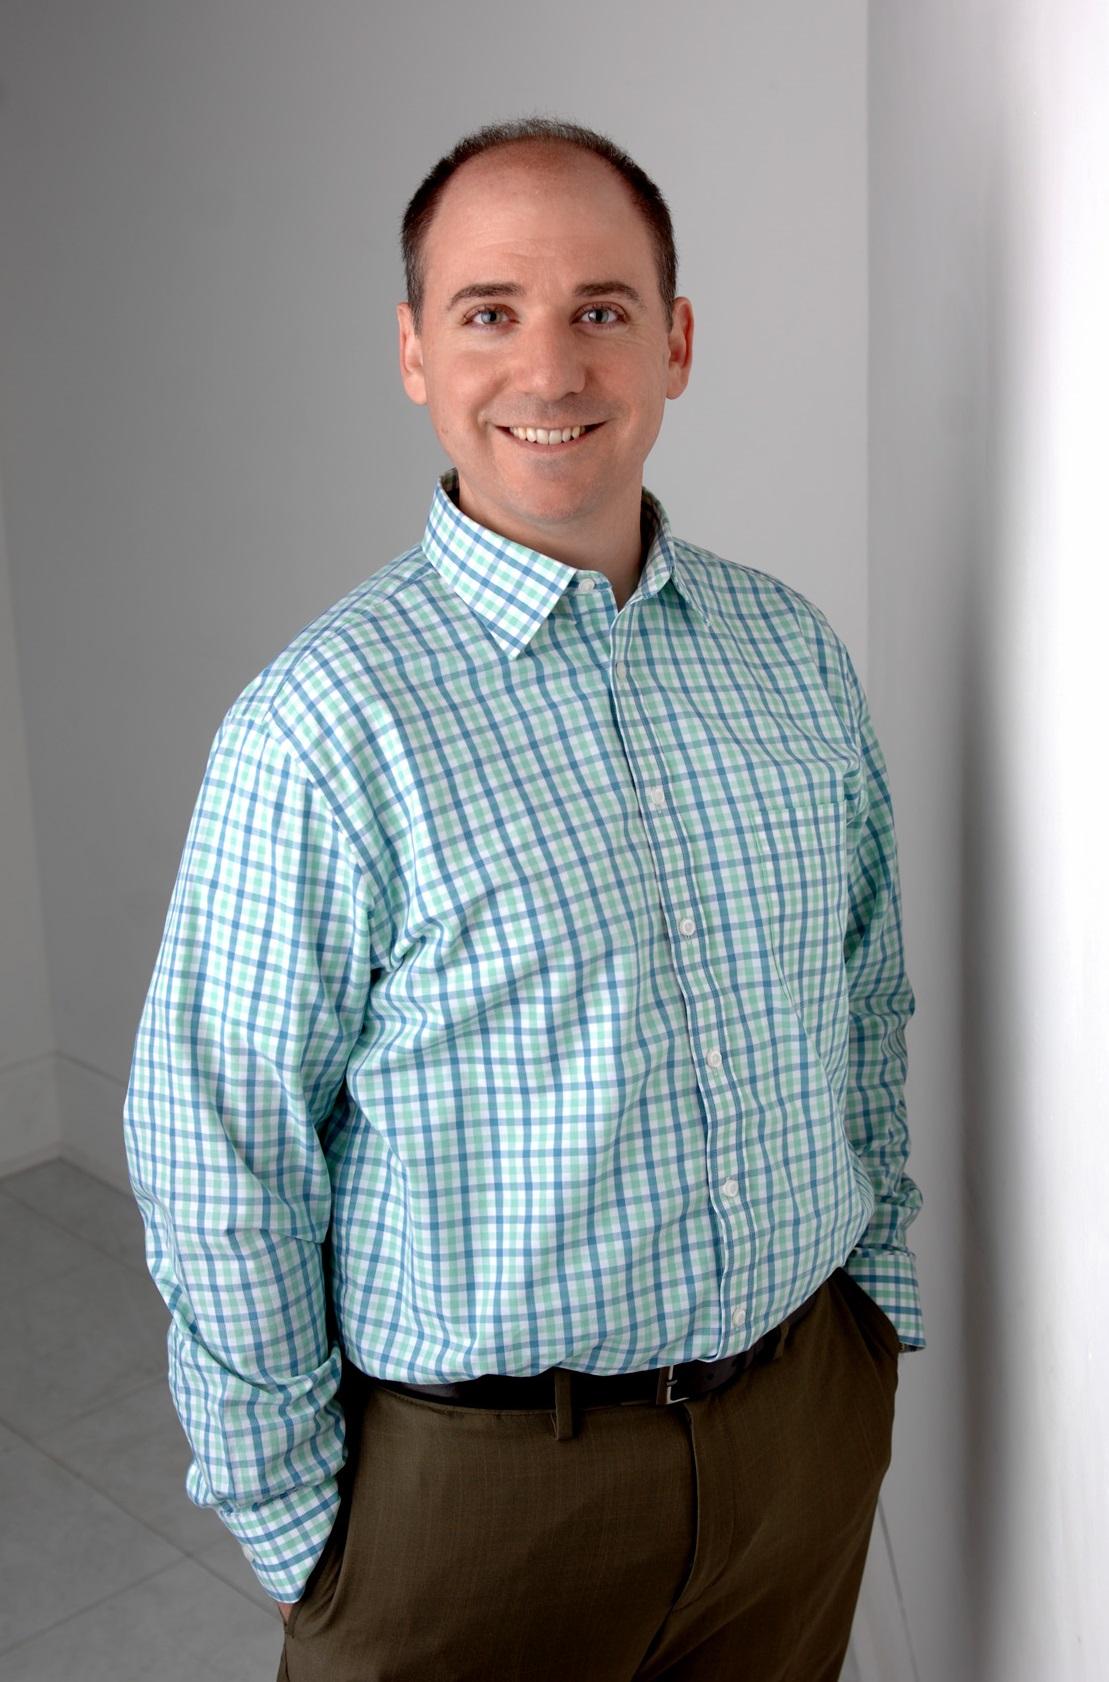 New Ulm Chiropractor, Dr. Nick Hoxmeier